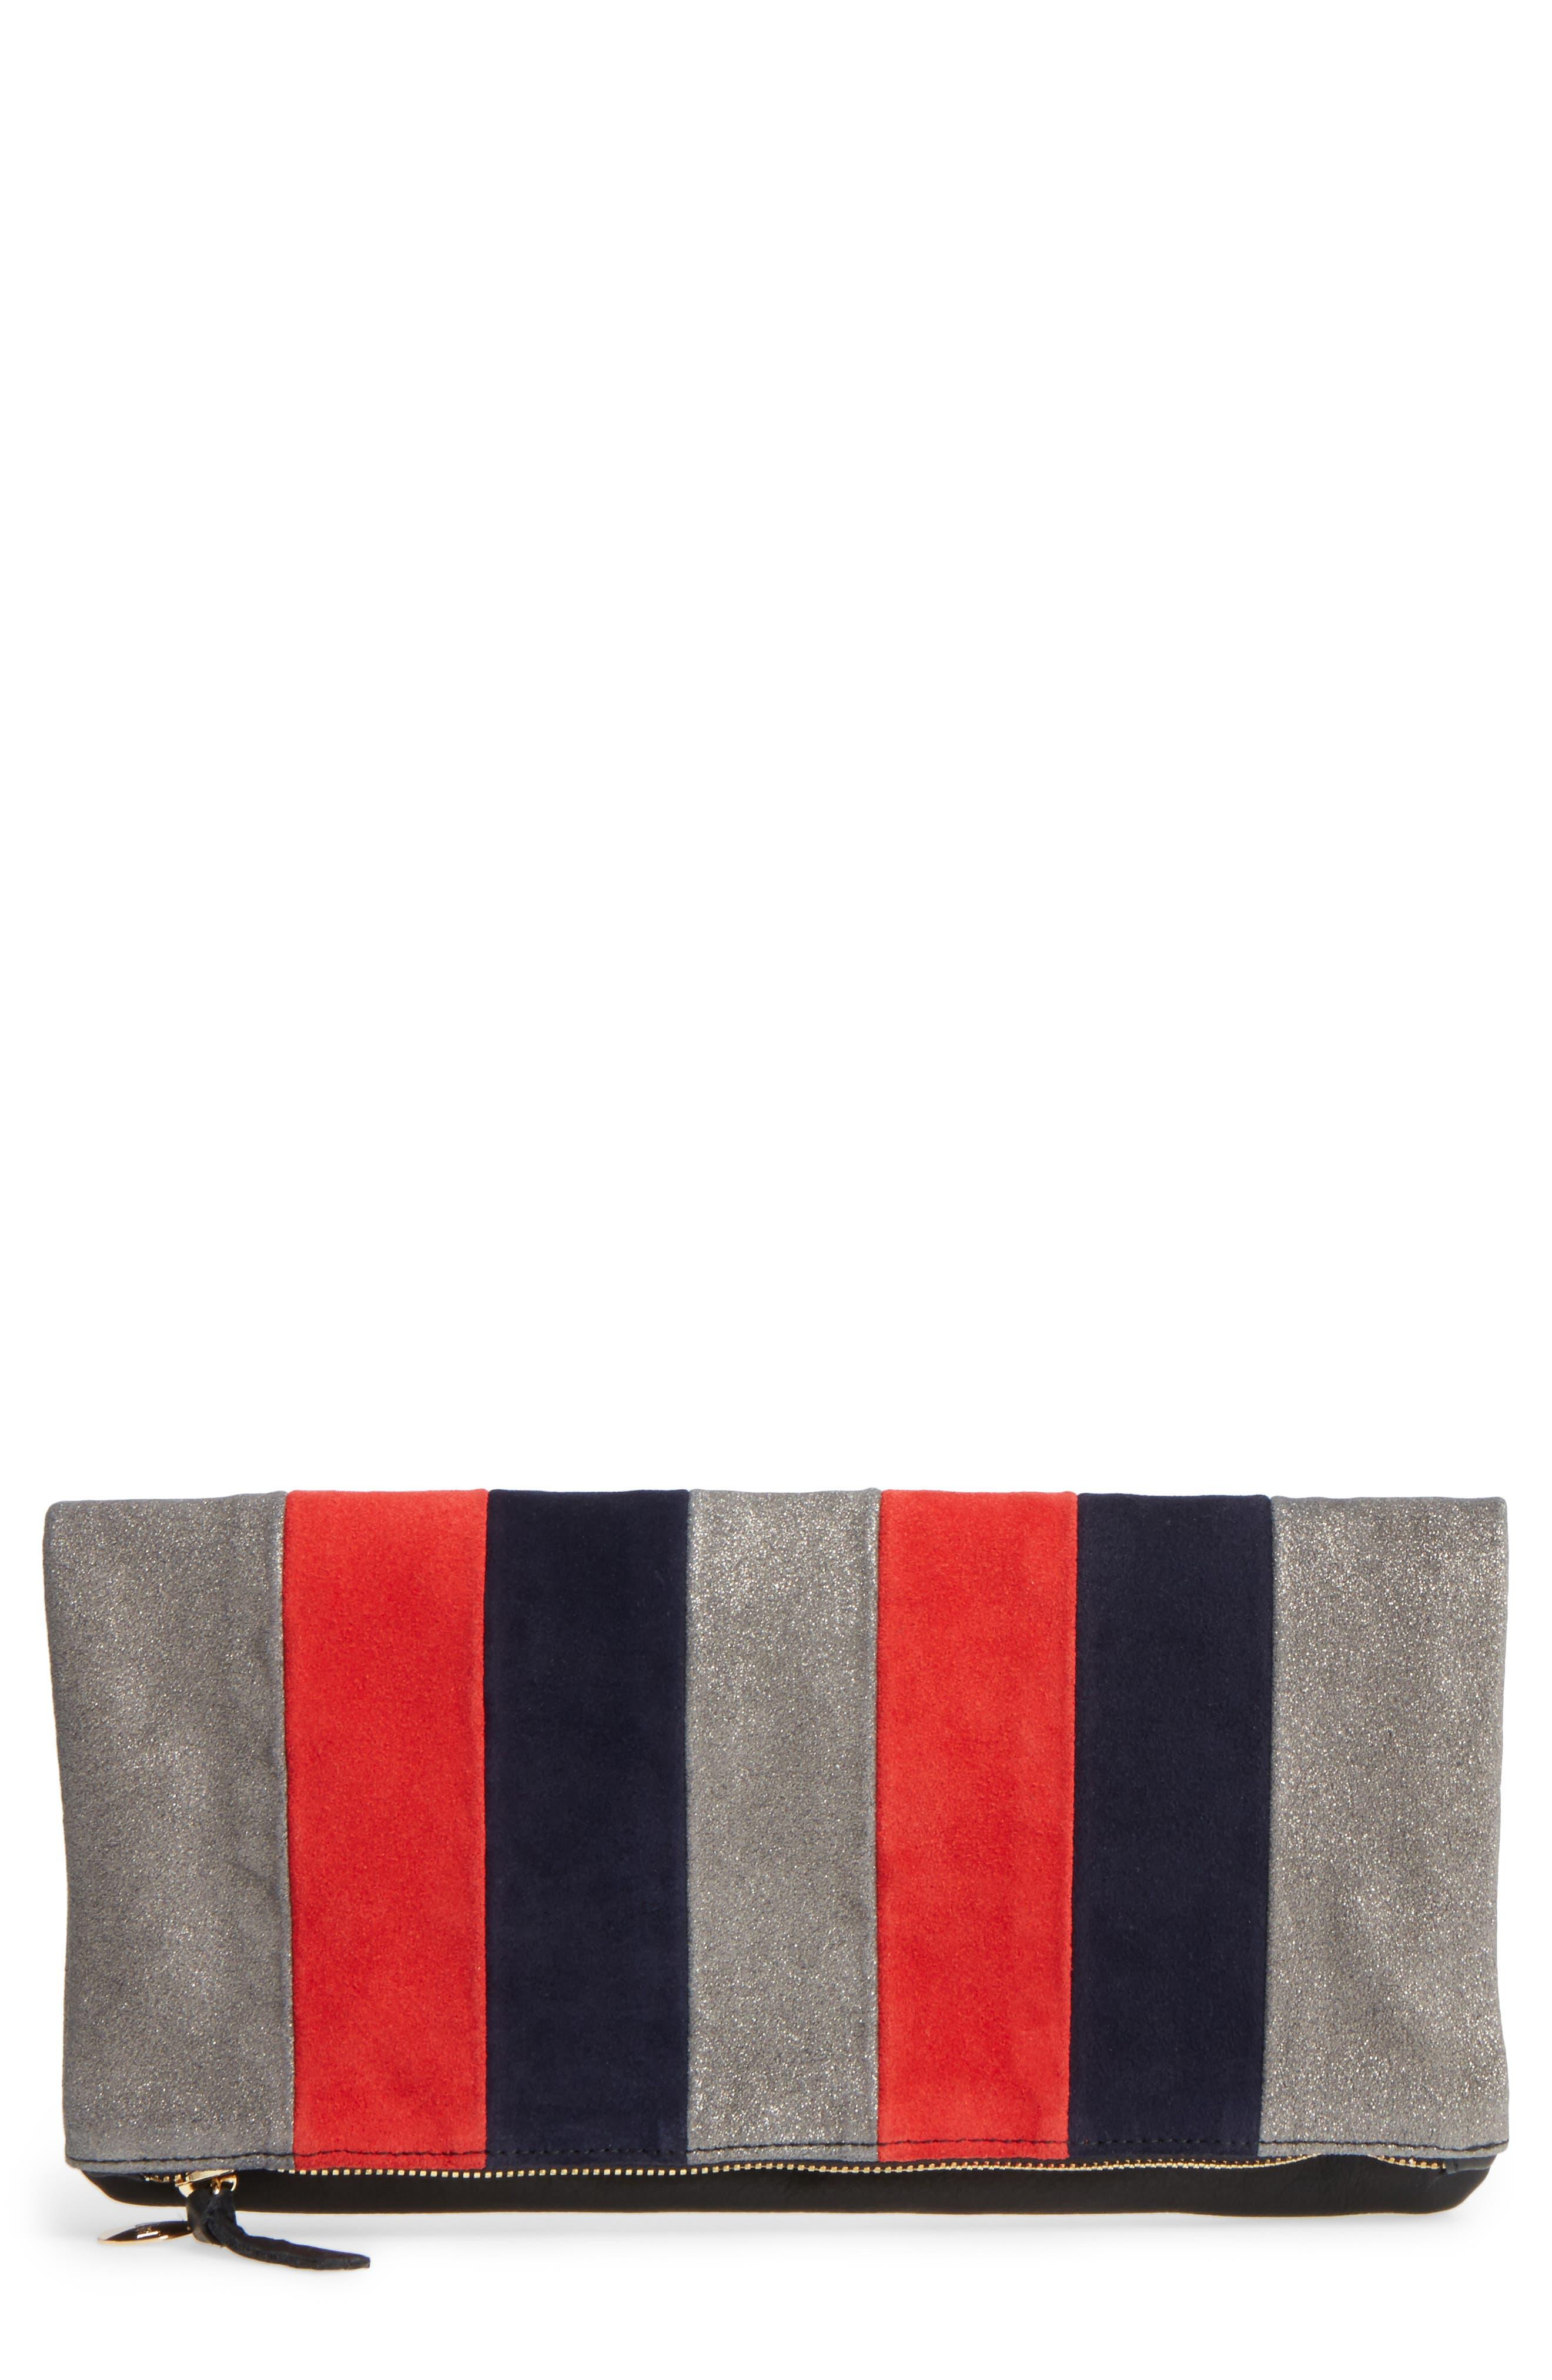 Clare V. Mixed Media Stripe Leather Foldover Clutch